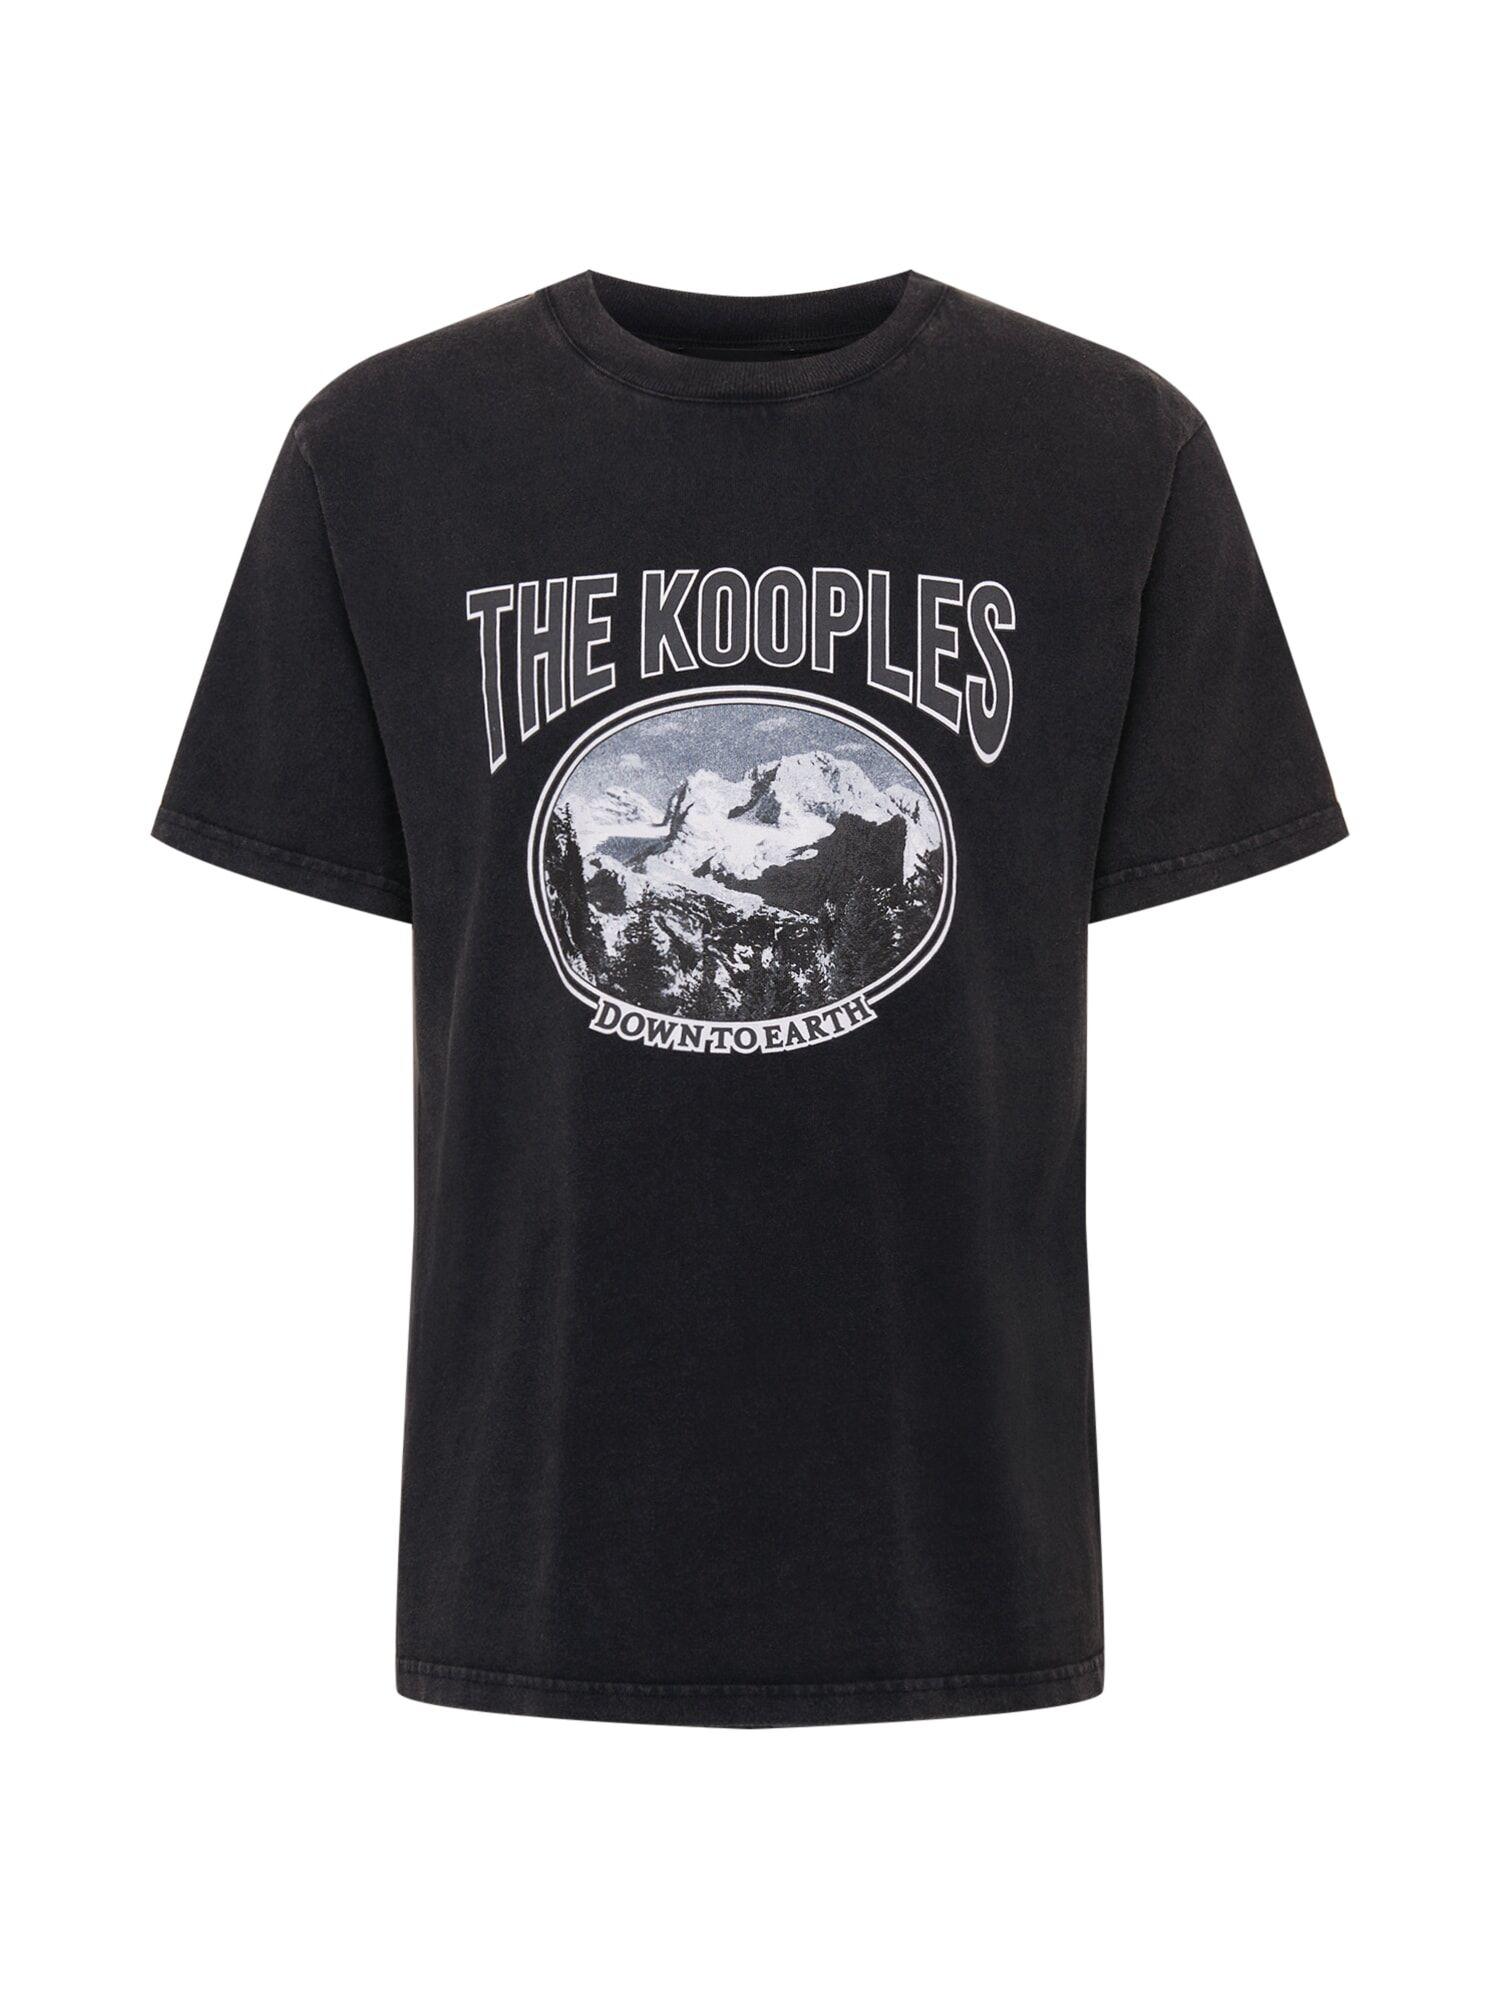 The Kooples T-Shirt  - Noir - Taille: S - male